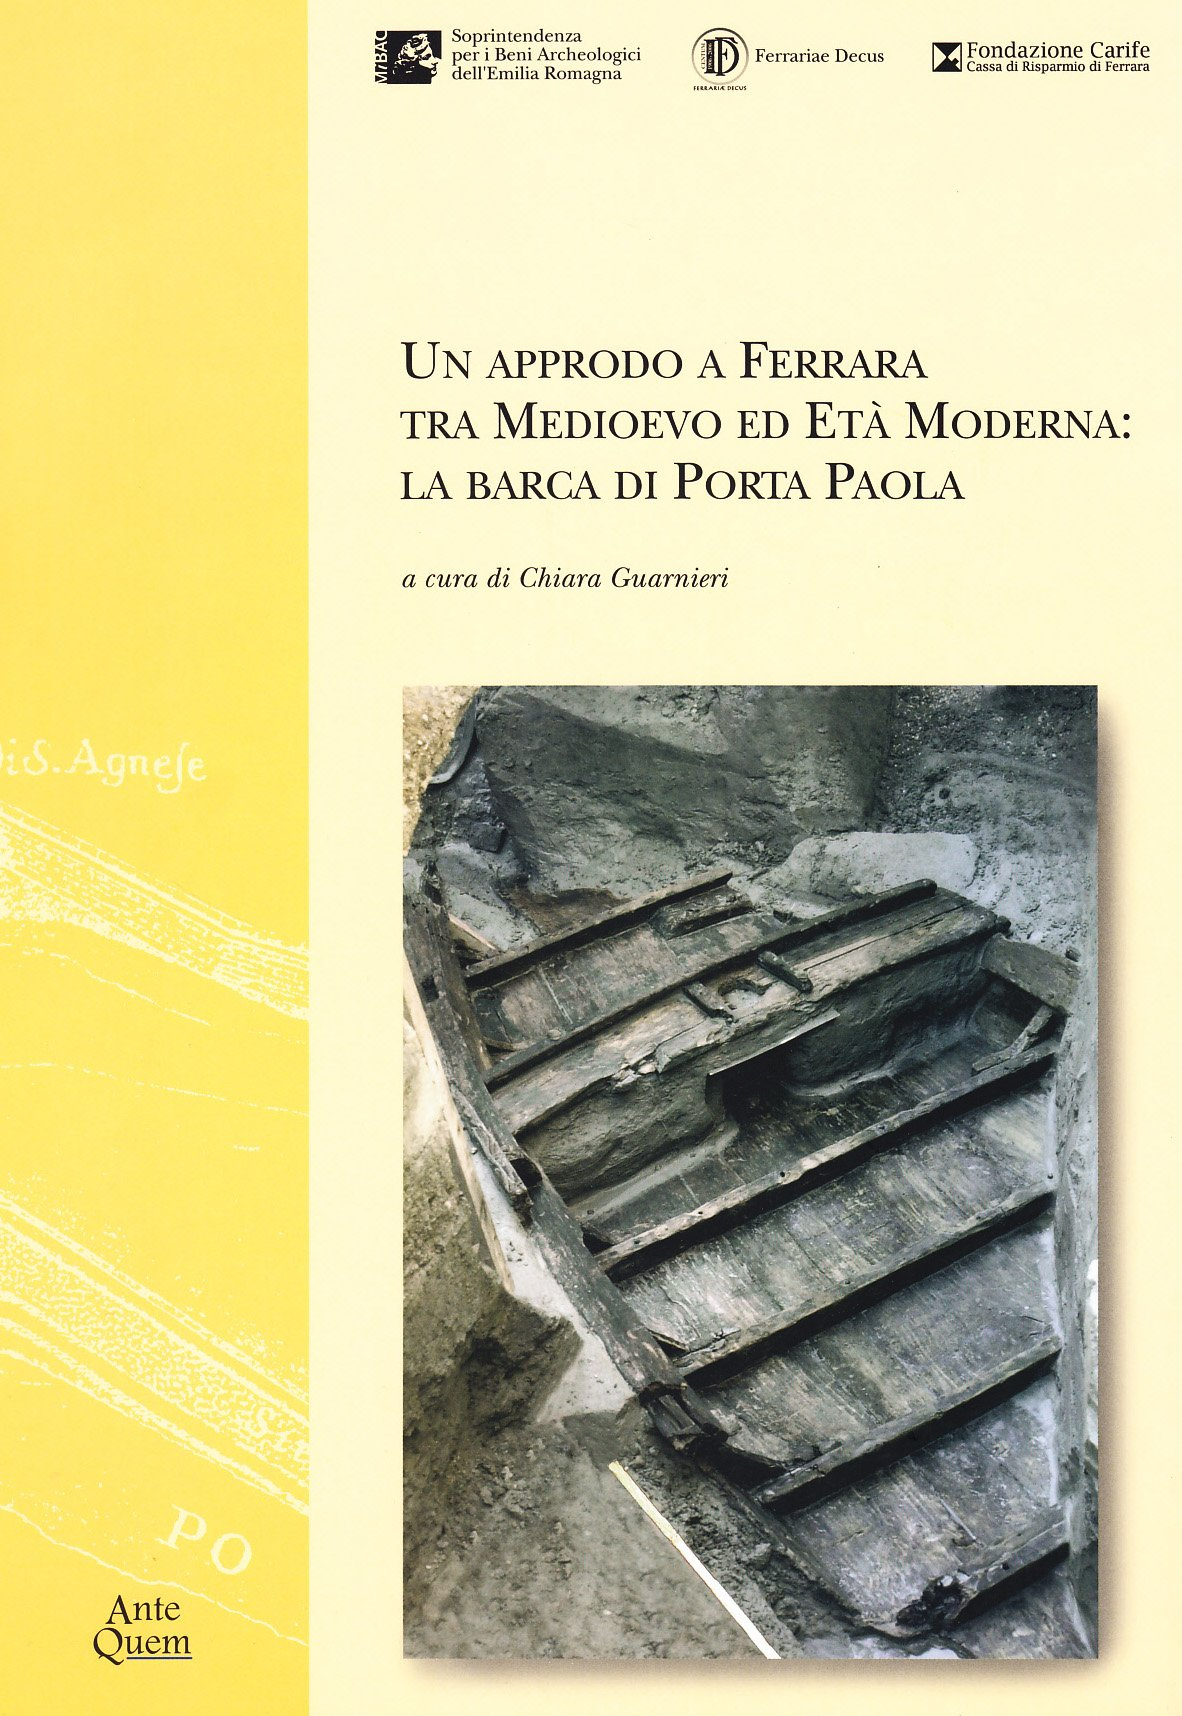 Un approdo a Ferrara tra medioevo ed età moderna. La barca di Porta Paola: Amazon.es: Guarnieri, C.: Libros en idiomas extranjeros